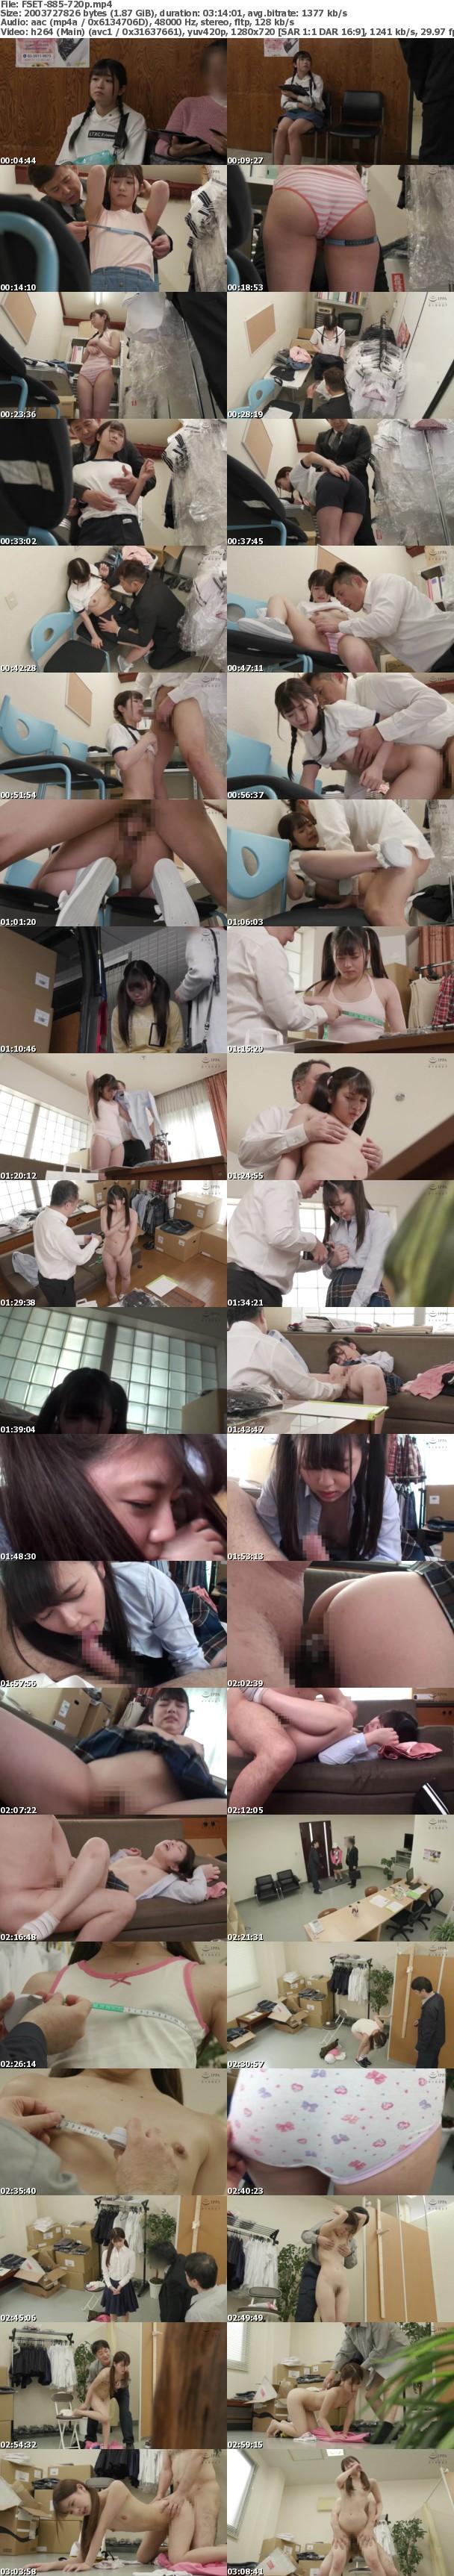 (HD) FSET-885 入学準備で学校指定販売店にやってきた胸の膨らみはじめの無知な女の子に盗撮イタズラ